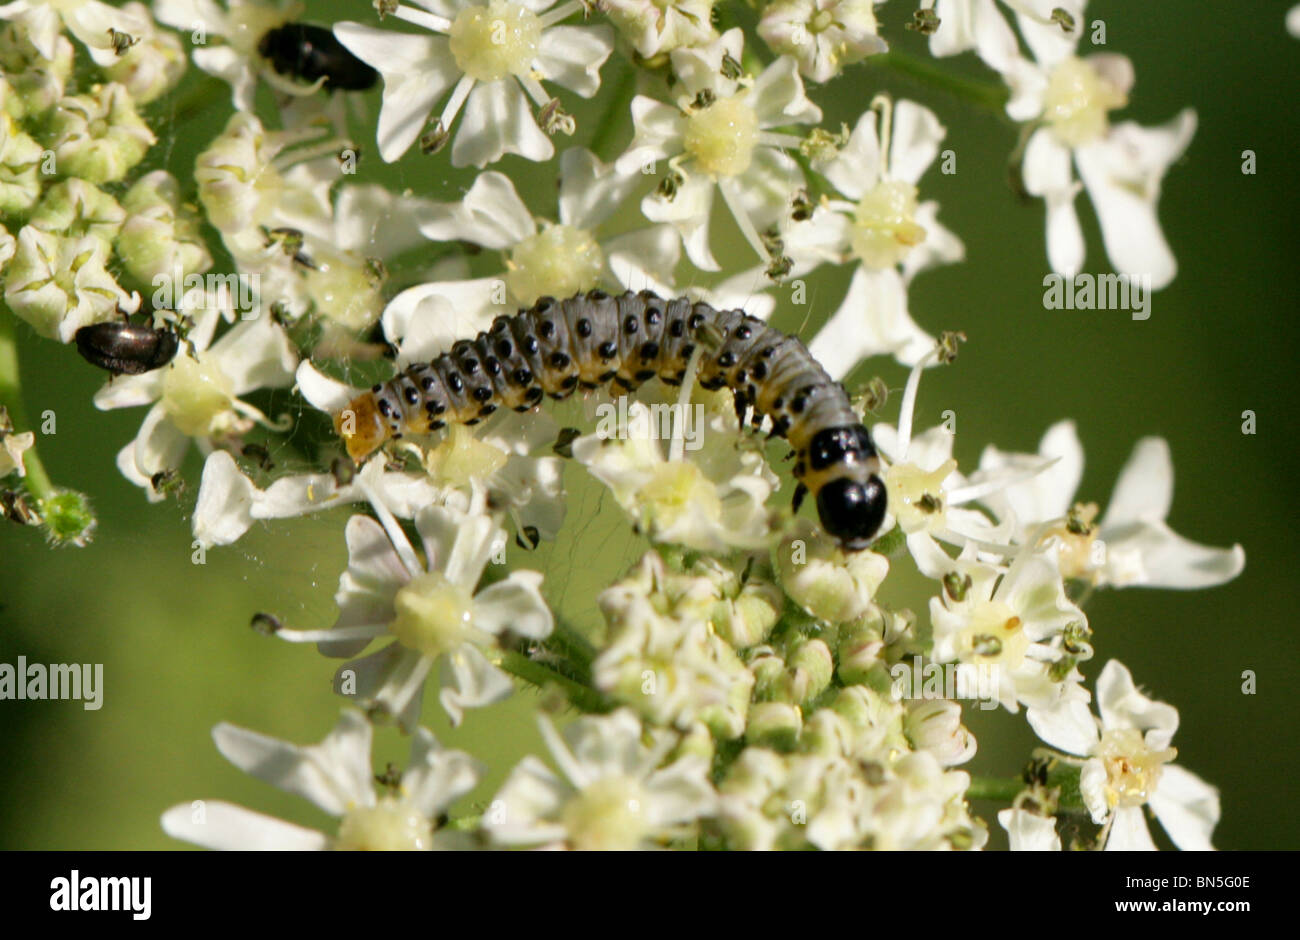 Parsnip Moth or Parsnip Webworm Larva, Depressaria pastinacella, Depressariinae, Oecophoridae, Lepidoptera Feeding - Stock Image